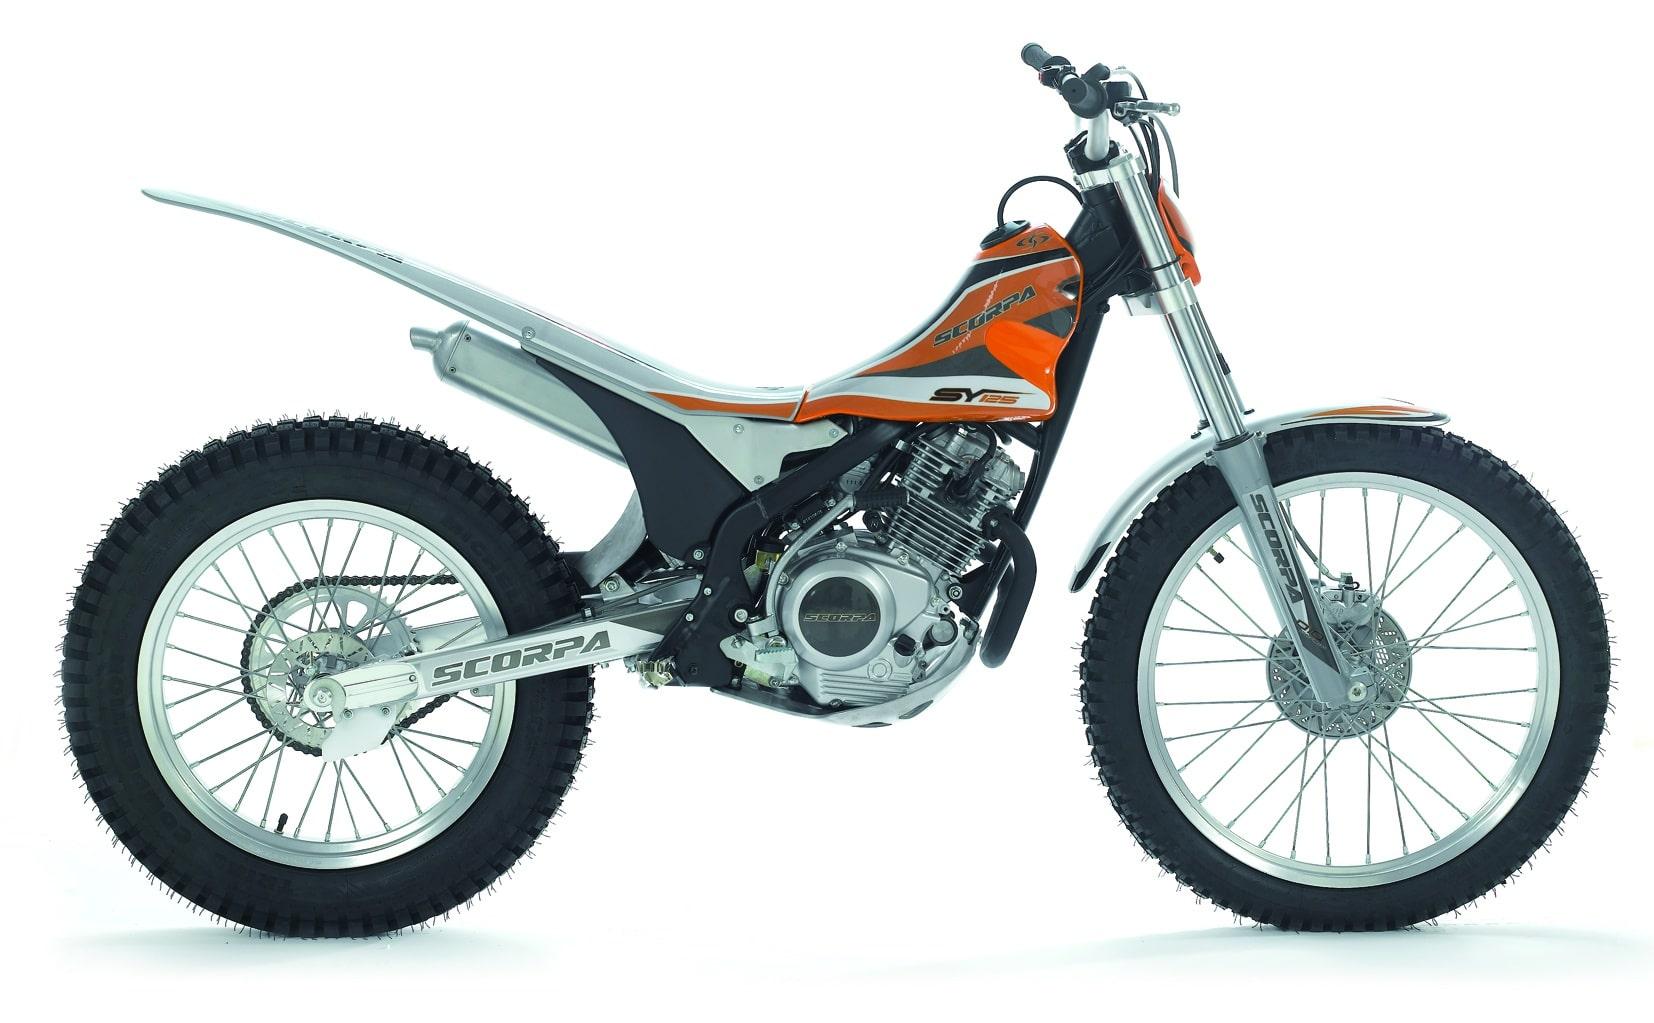 Honda Nord Sud >> Scorpa SY FR 2012 - Trial Magazine